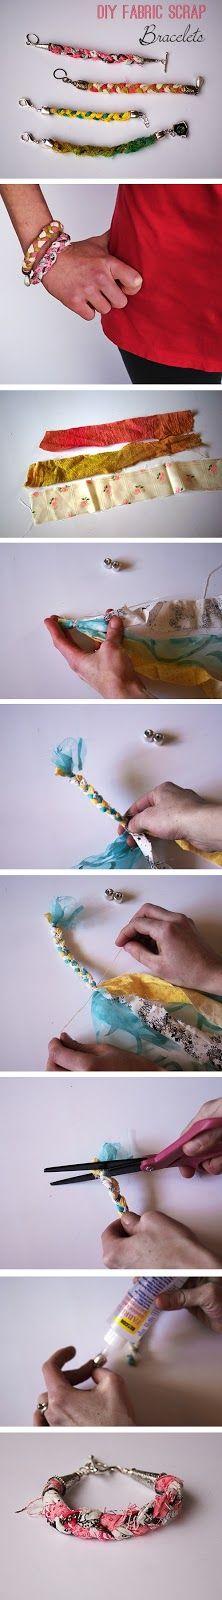 Make Fabric Scrap Bracelets